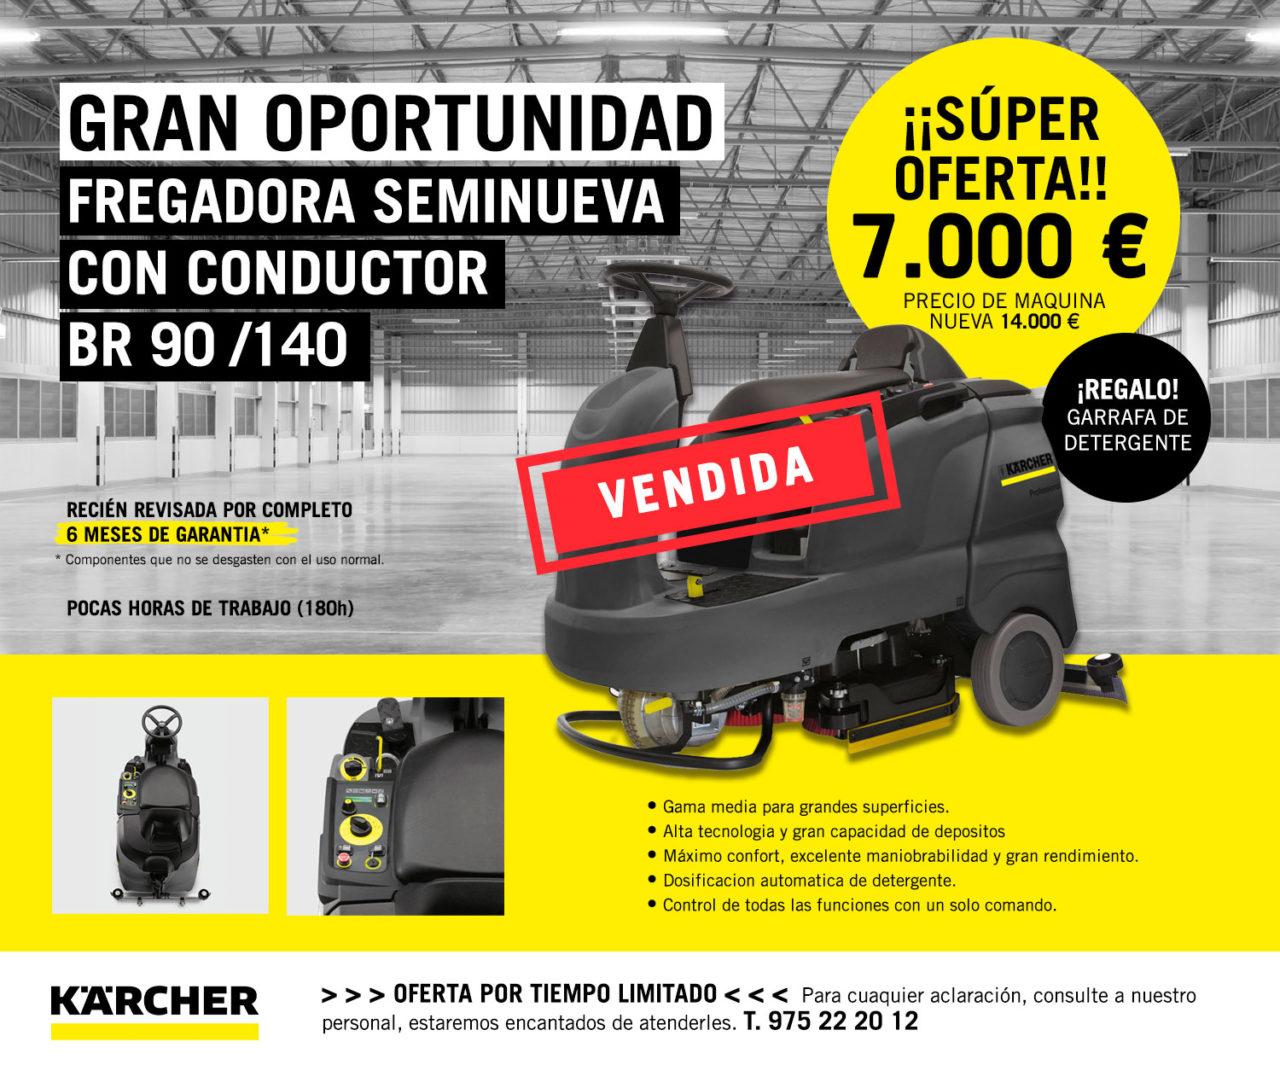 oferta-fregadora-karcher-vendida-1280x1065.jpg